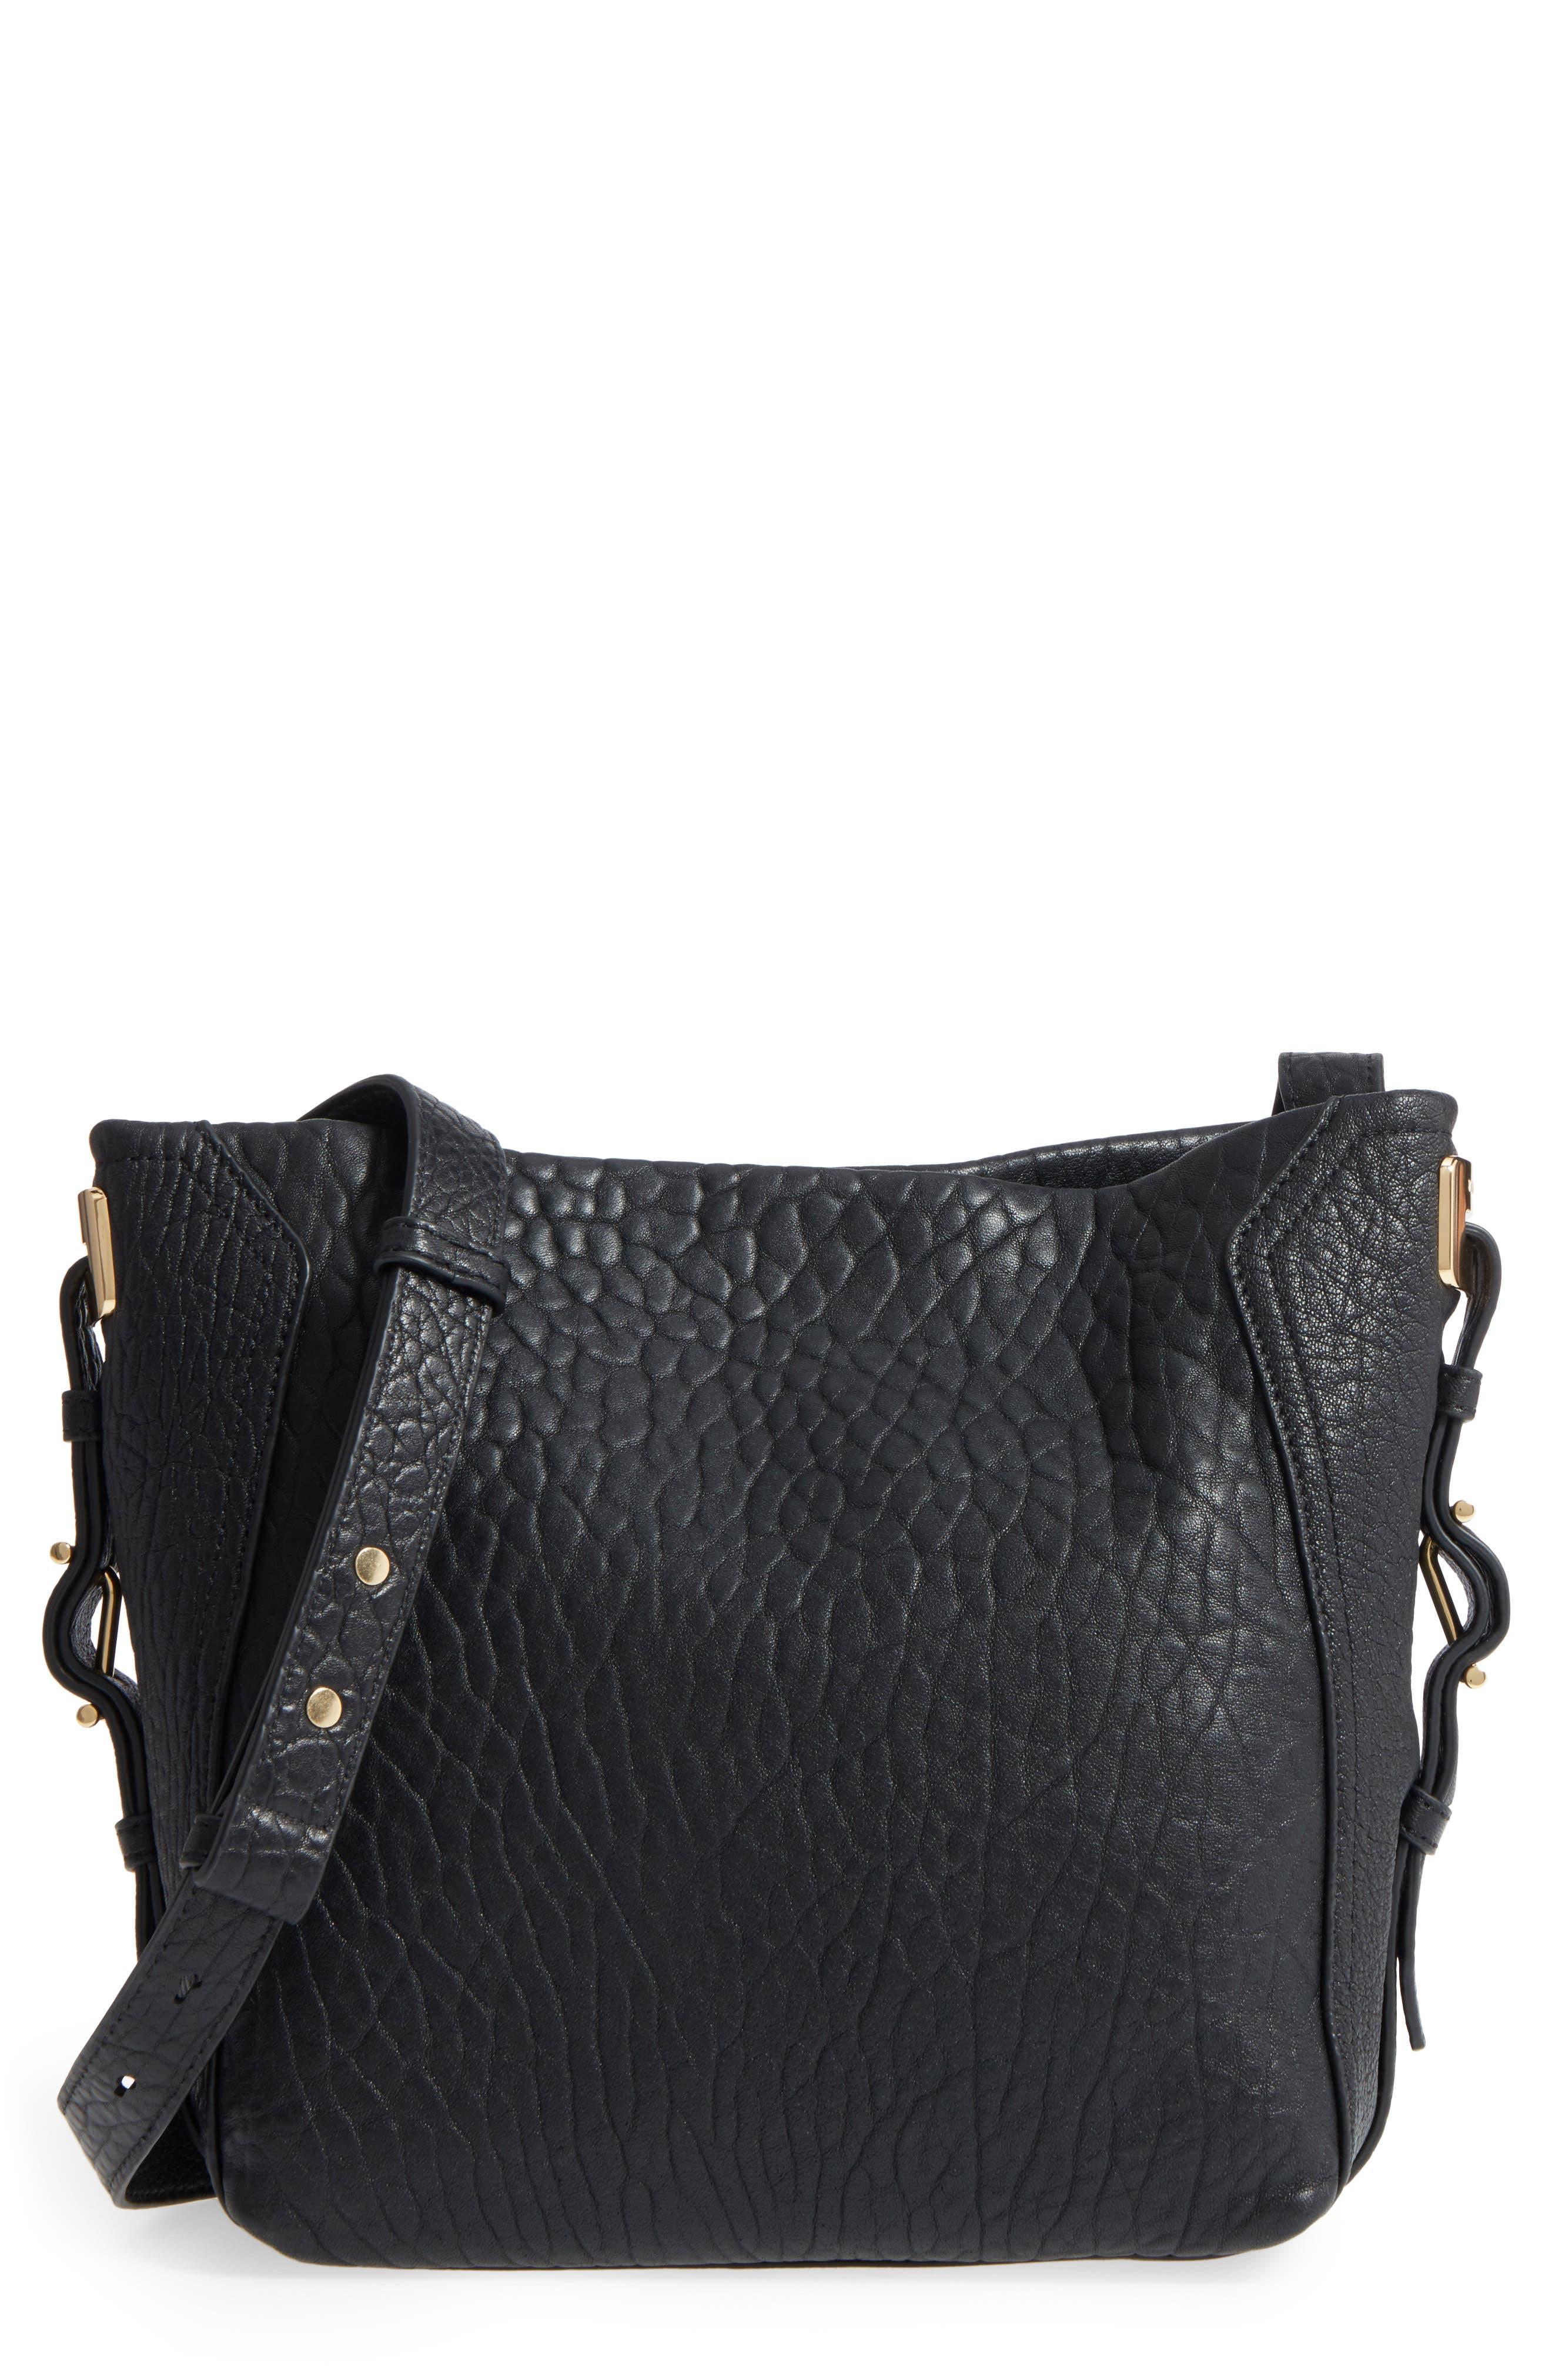 Fava Leather Bucket Bag,                             Main thumbnail 1, color,                             001